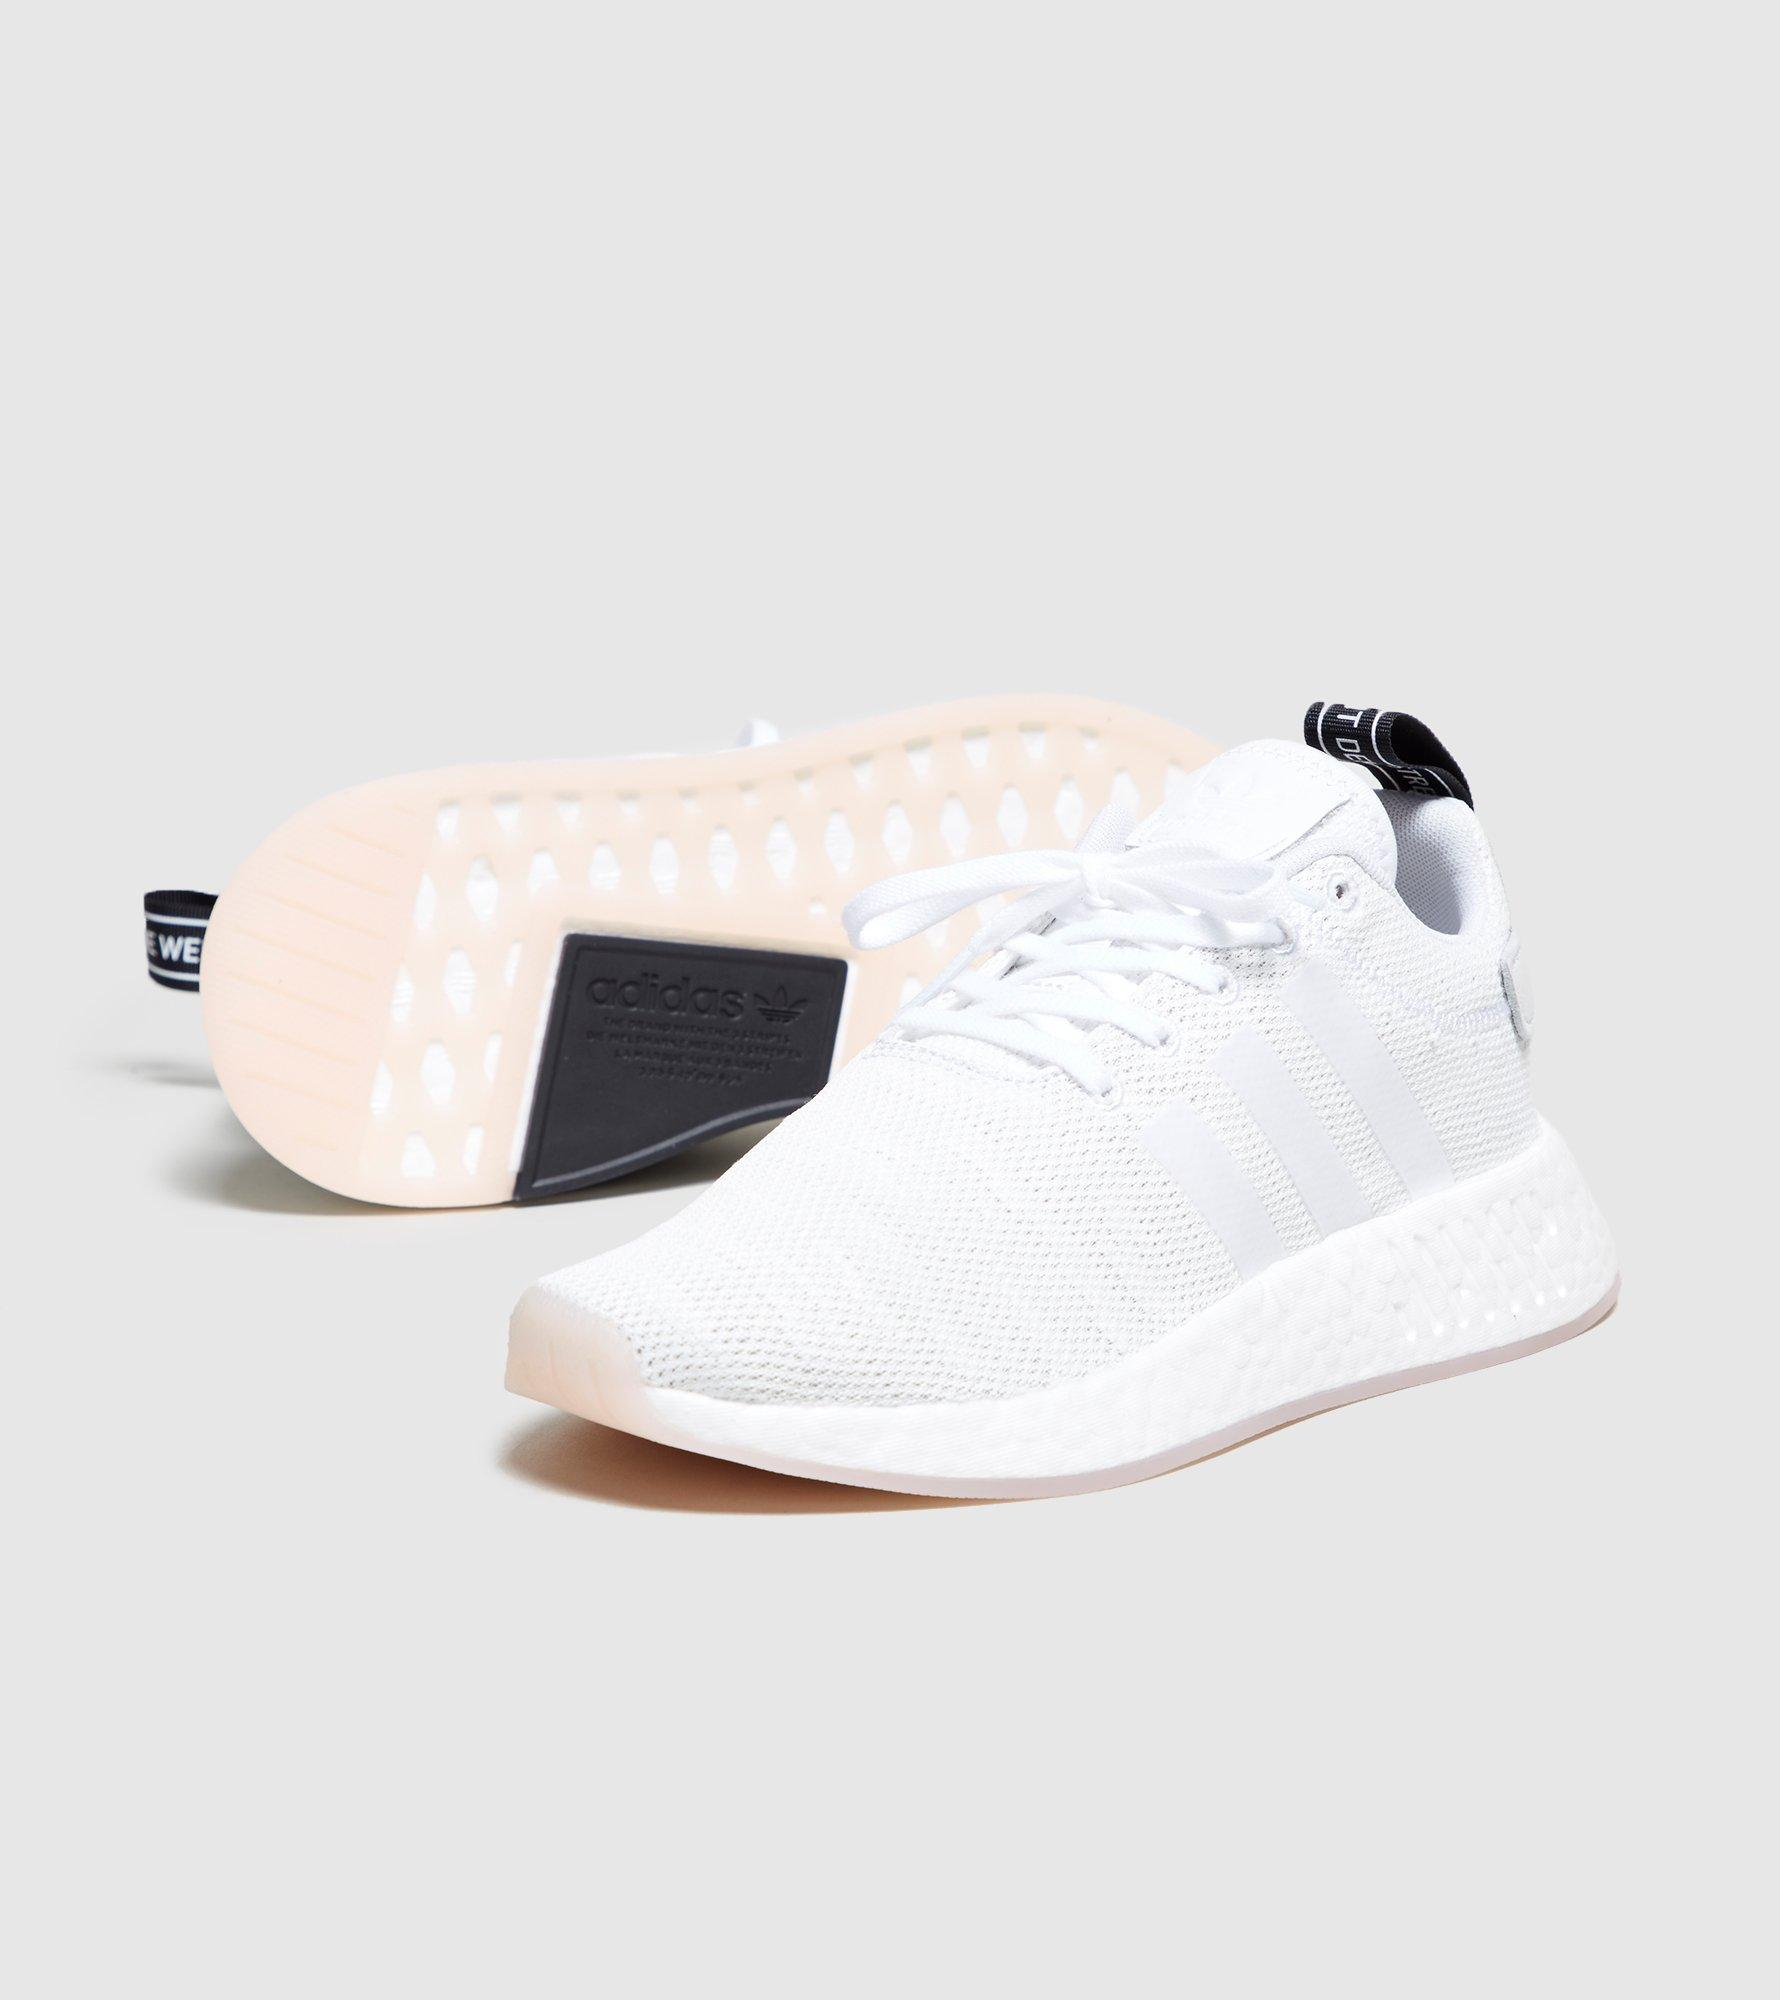 adidas Originals Nmd R2 Women s in White - Lyst 3e3641d30b